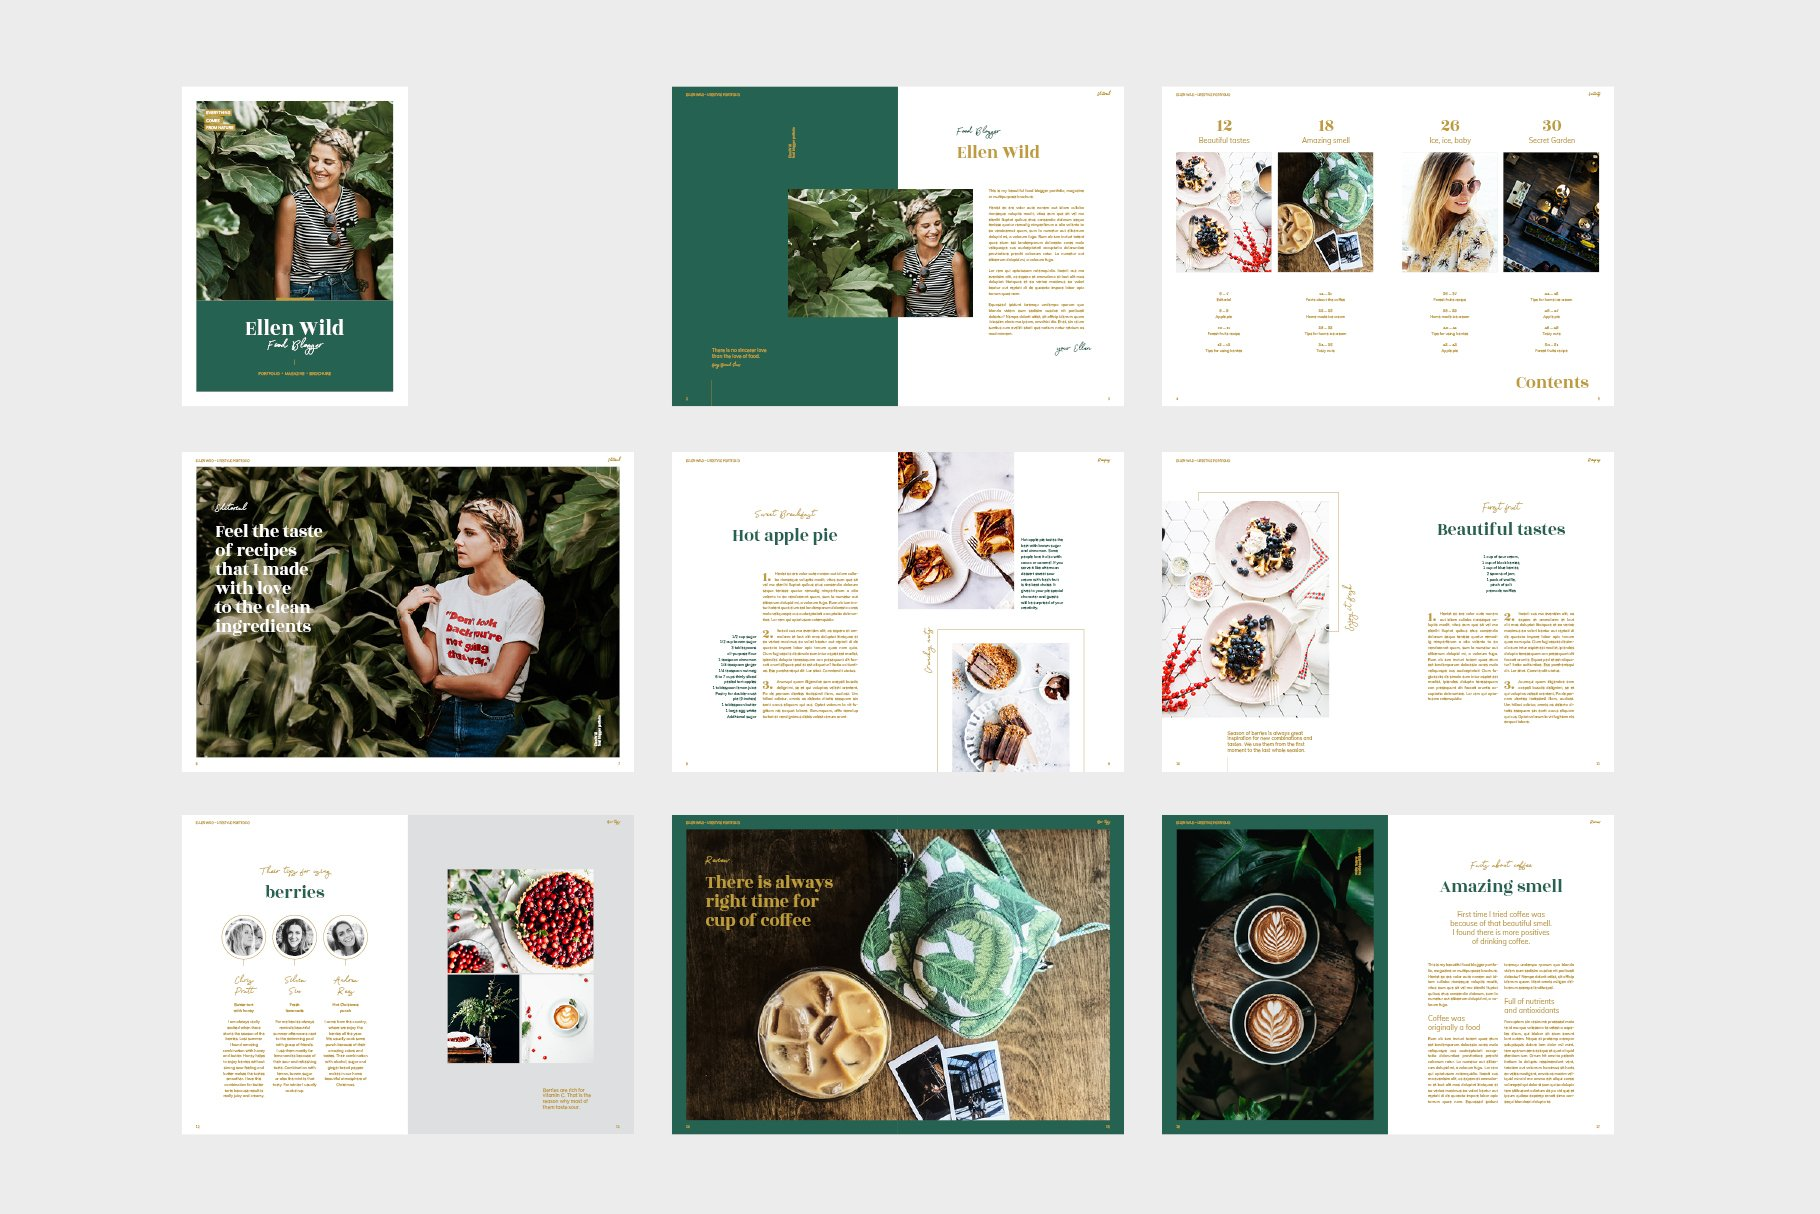 绿色烹饪生活画册模板 Green Duo Pack Magazine Templates